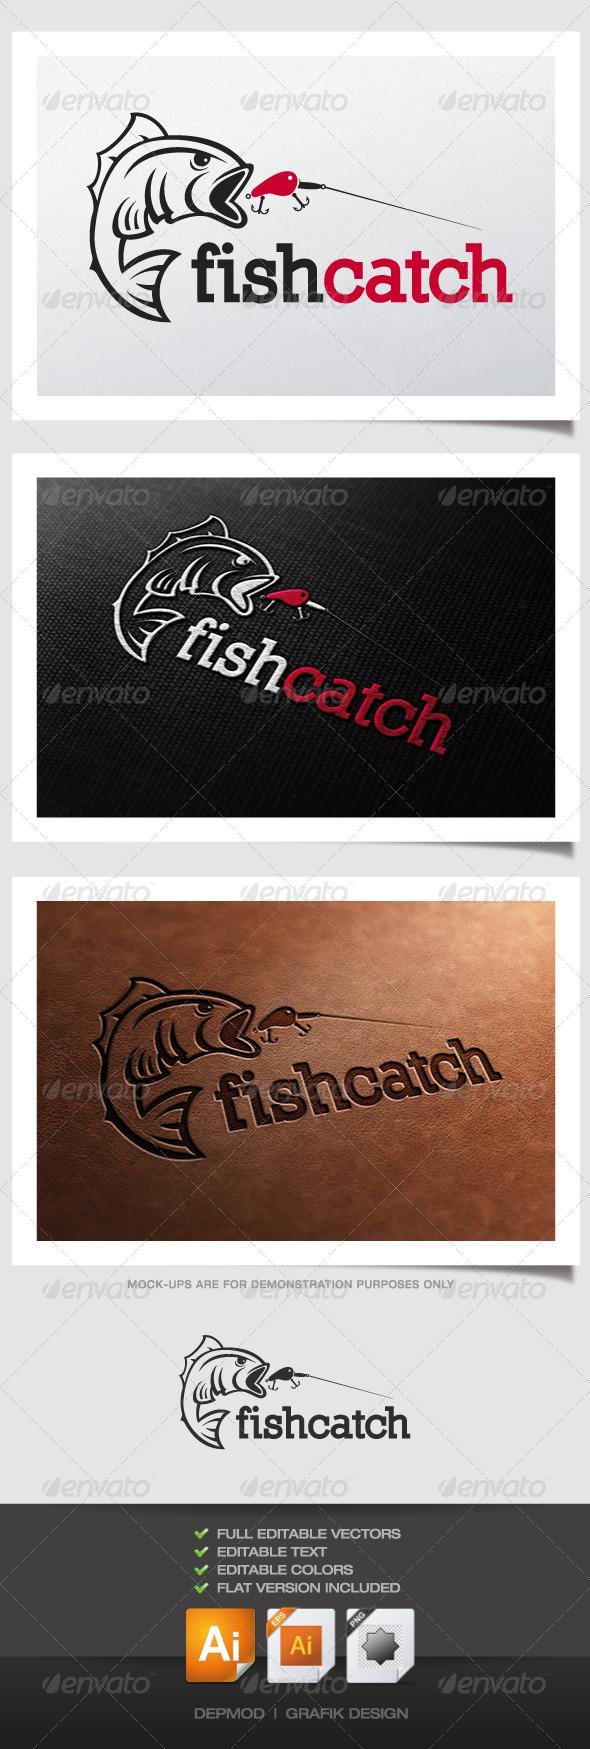 GraphicRiver Fish Catch Logo 4443624